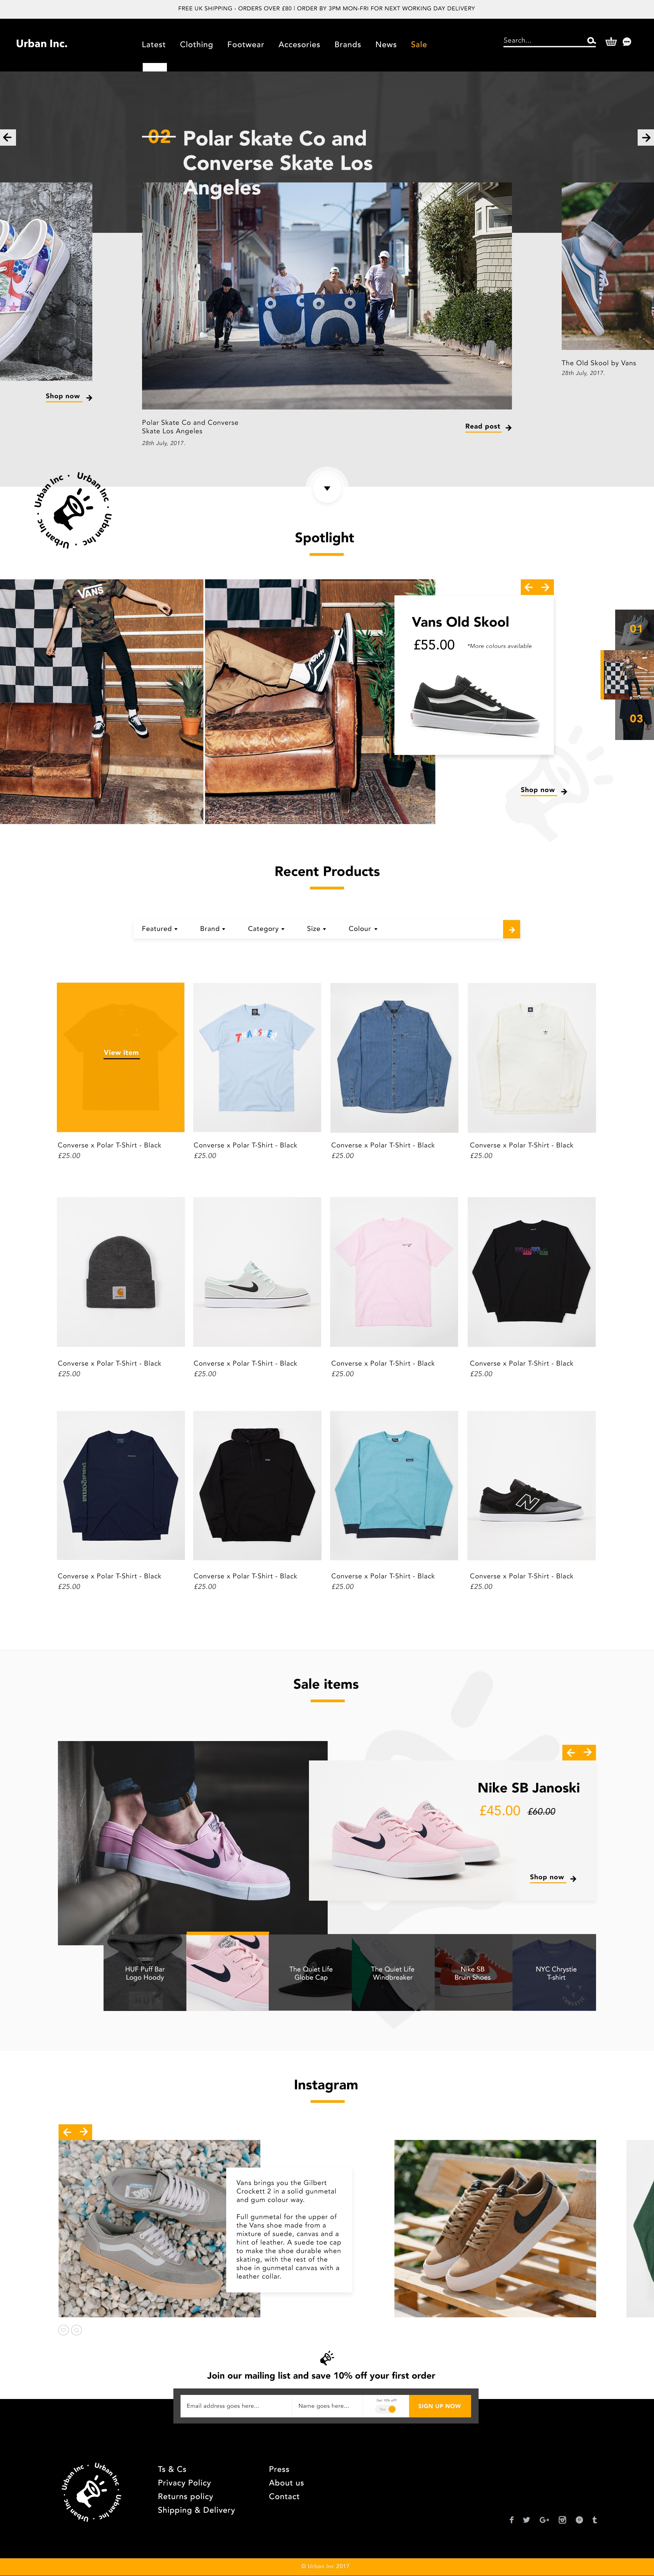 Store website hf